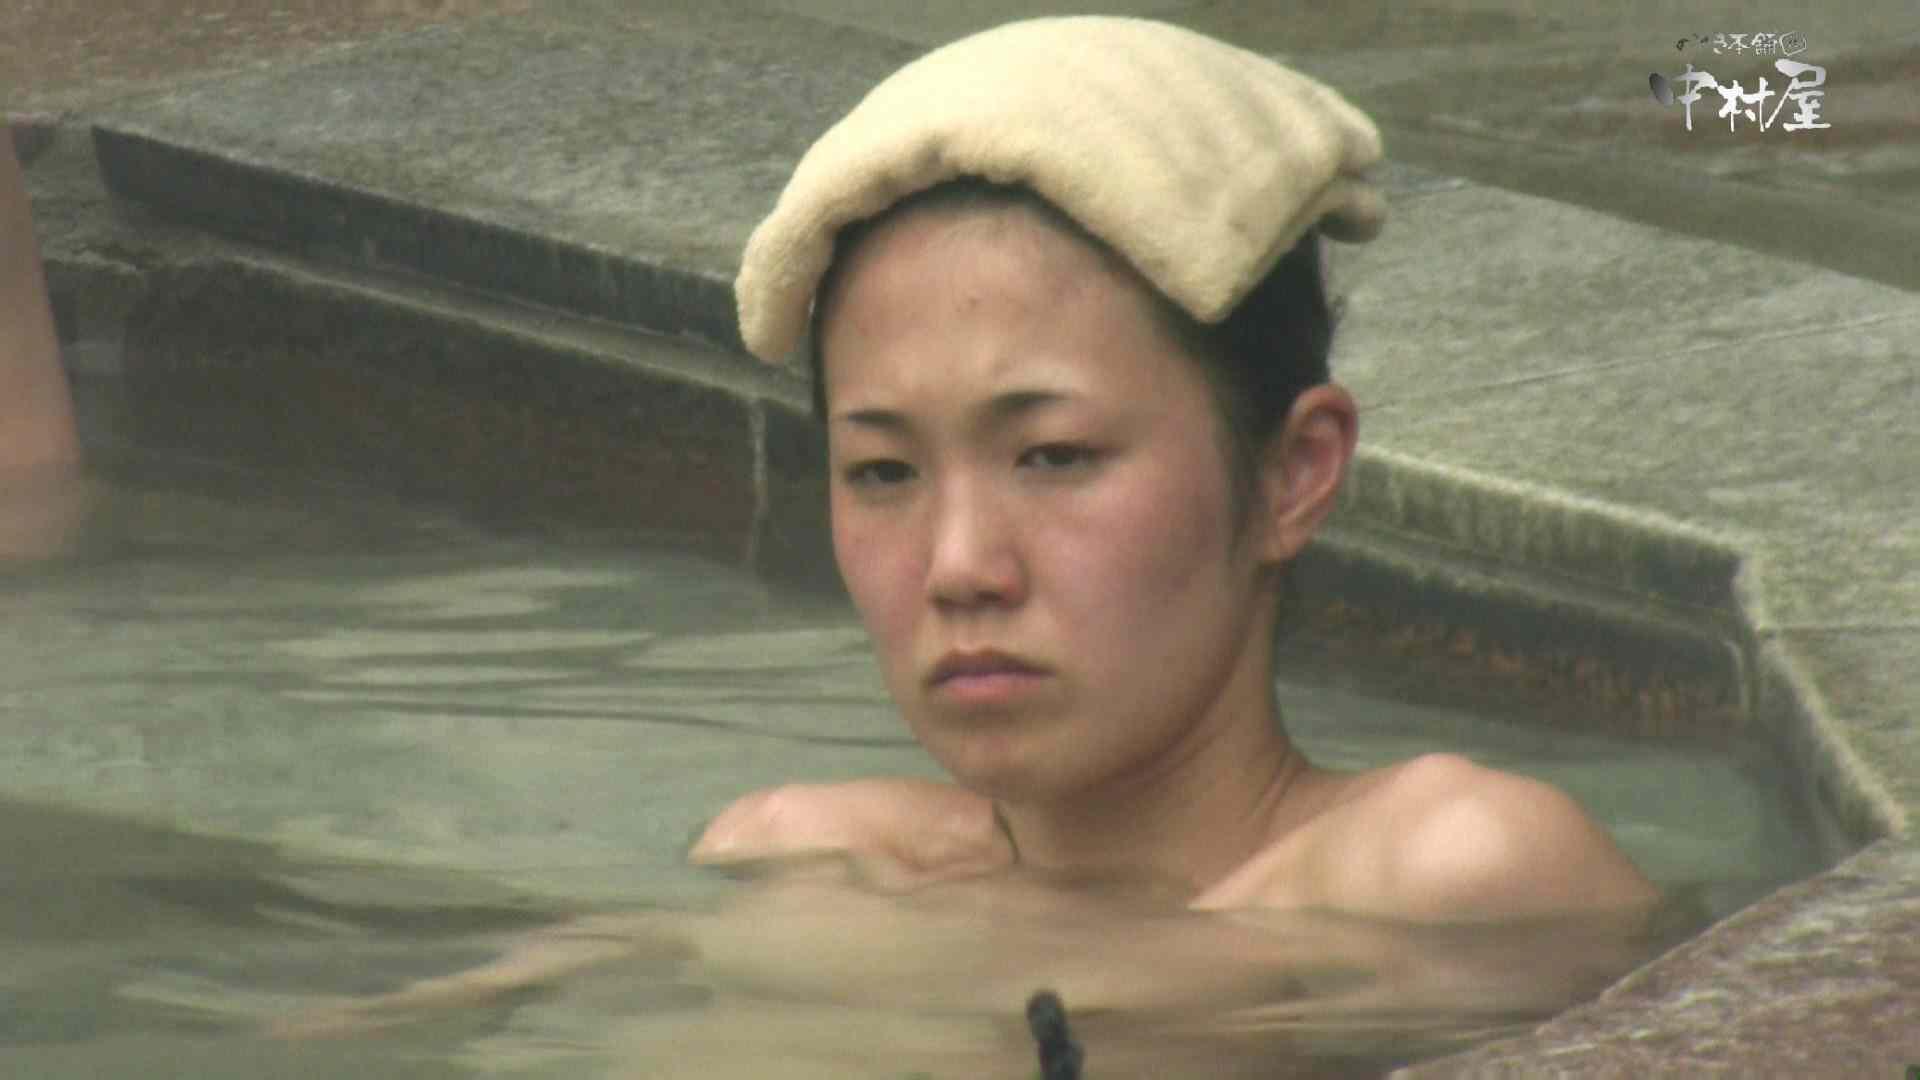 Aquaな露天風呂Vol.889 0   0  87連発 55